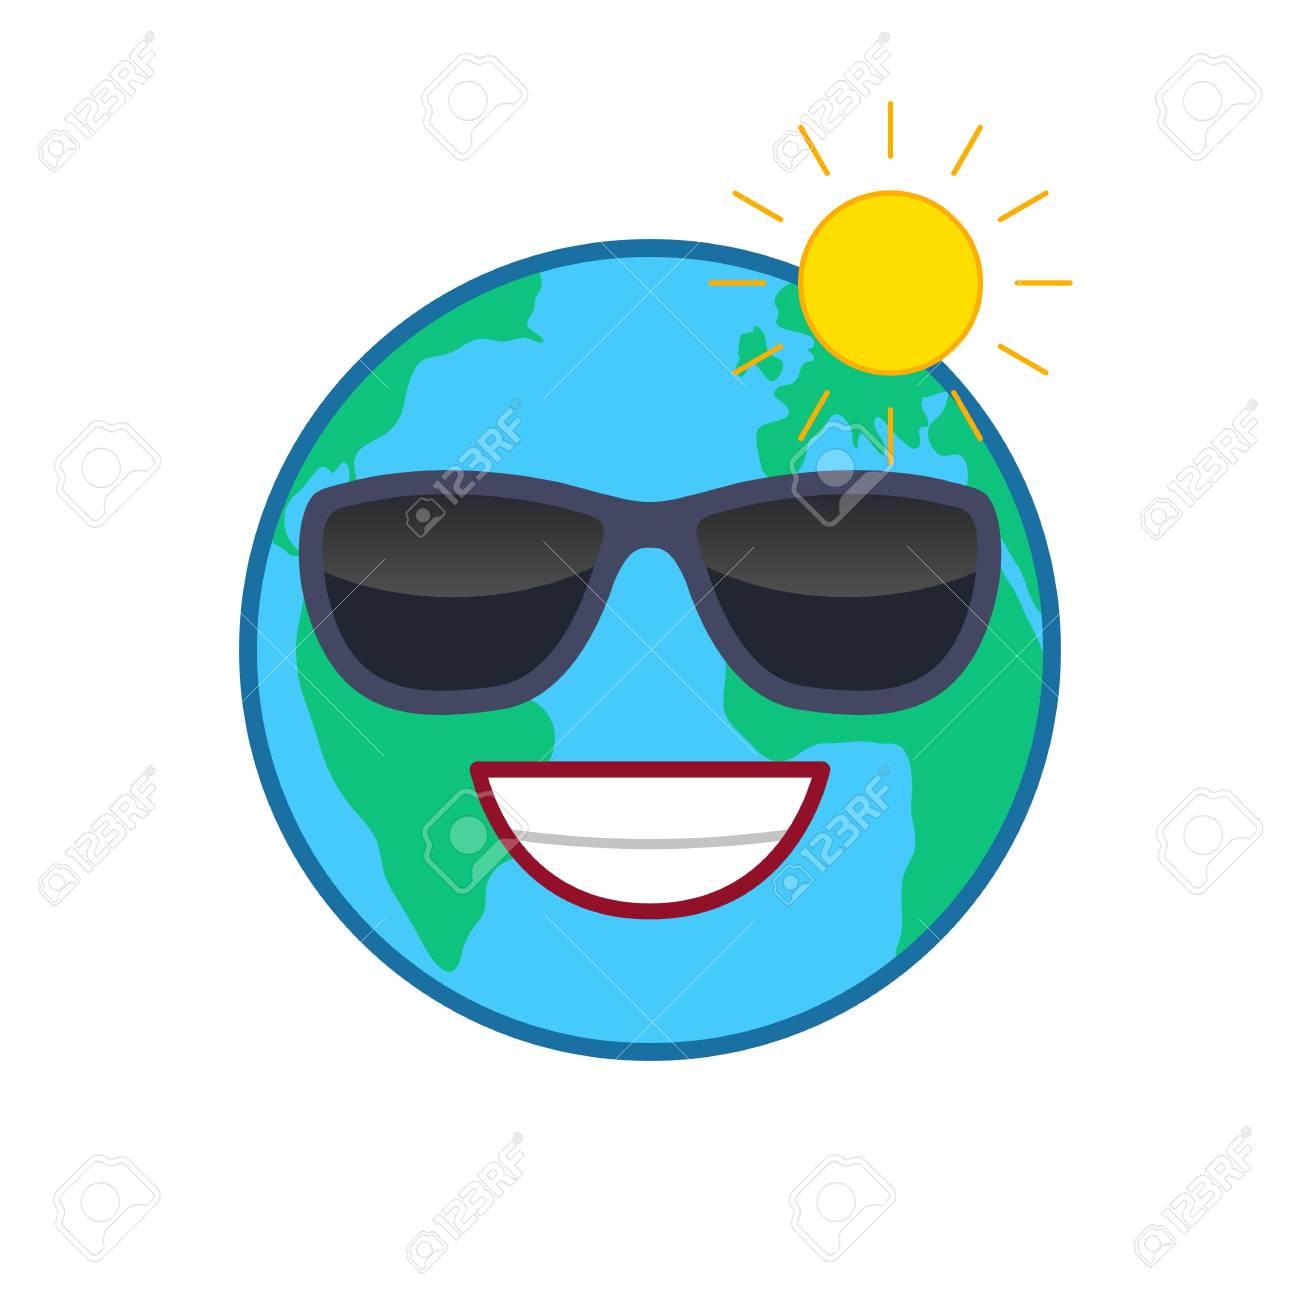 Laughing World Globe Isolated Emoticon Satisfied Planet Emoji